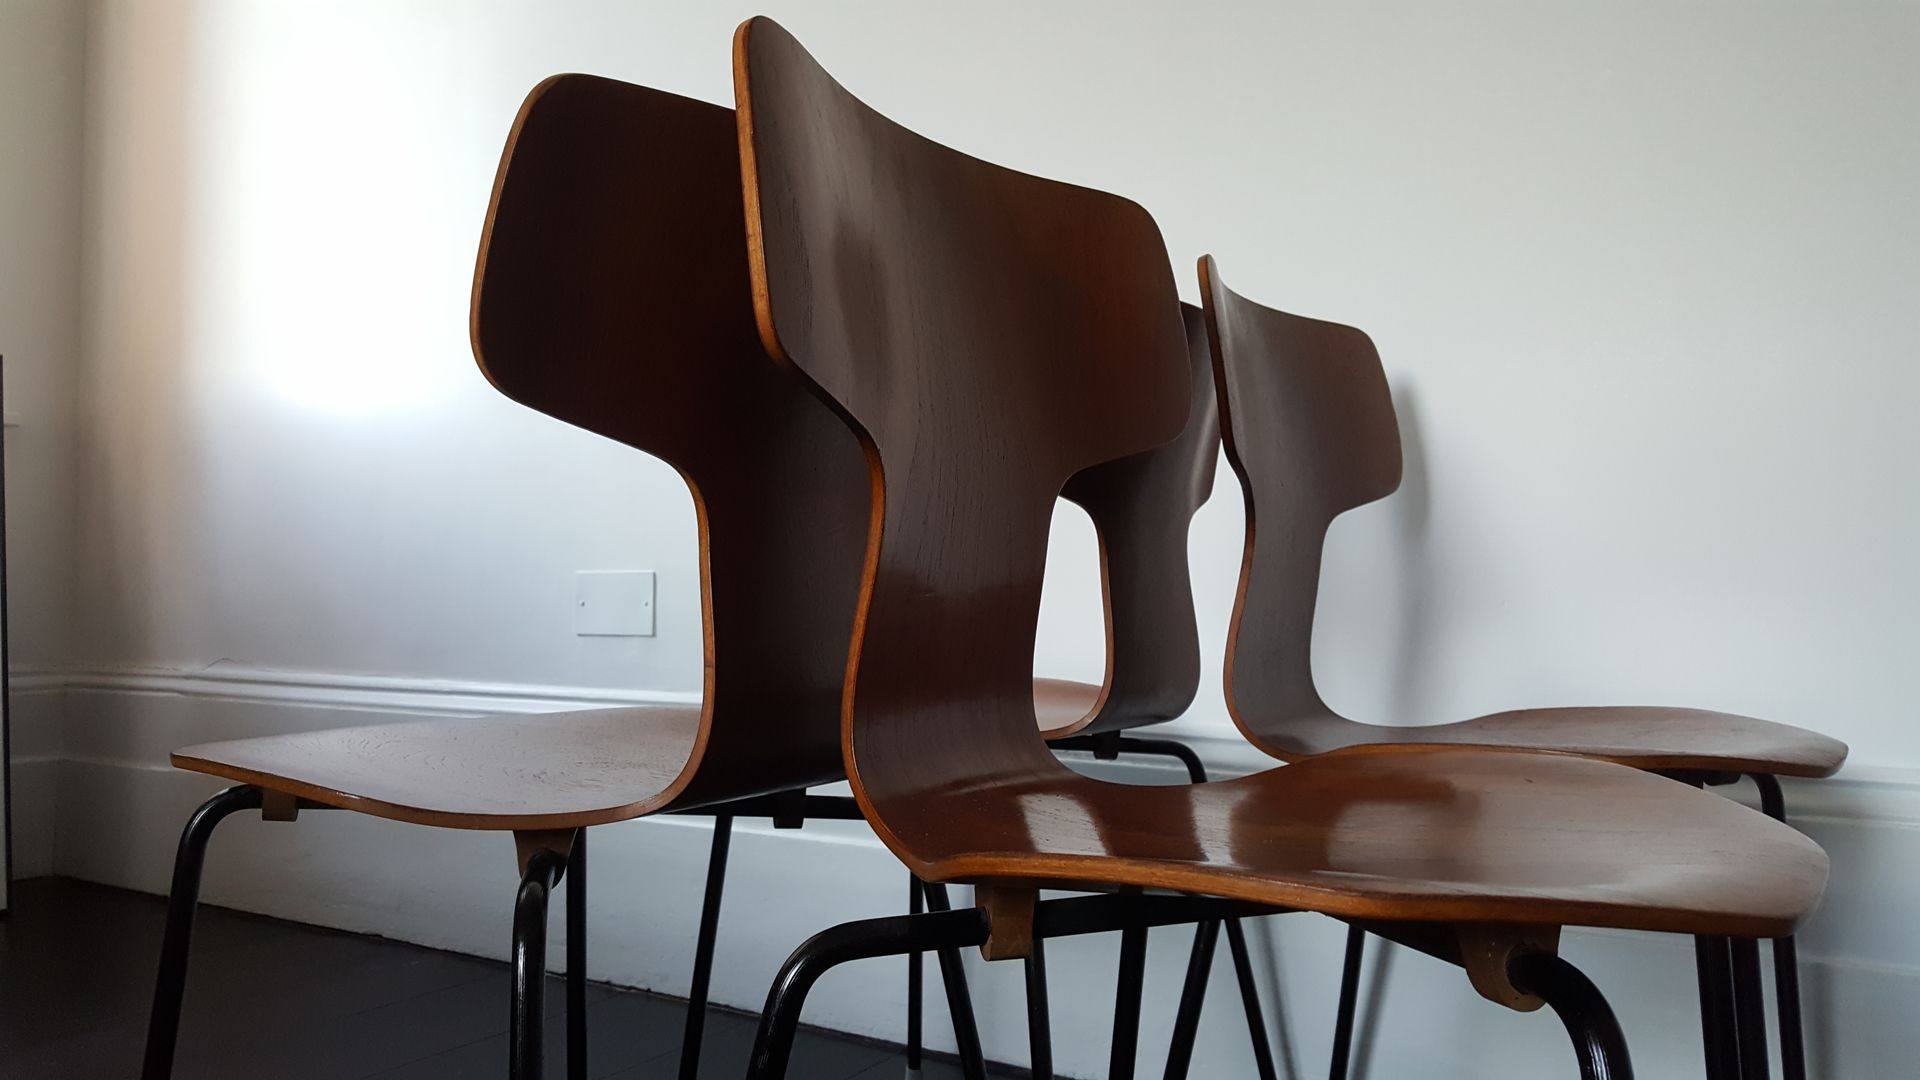 modell 3103 teak hammer st hle von arne jacobsen f r fritz hansen 1960er 4er set bei pamono kaufen. Black Bedroom Furniture Sets. Home Design Ideas